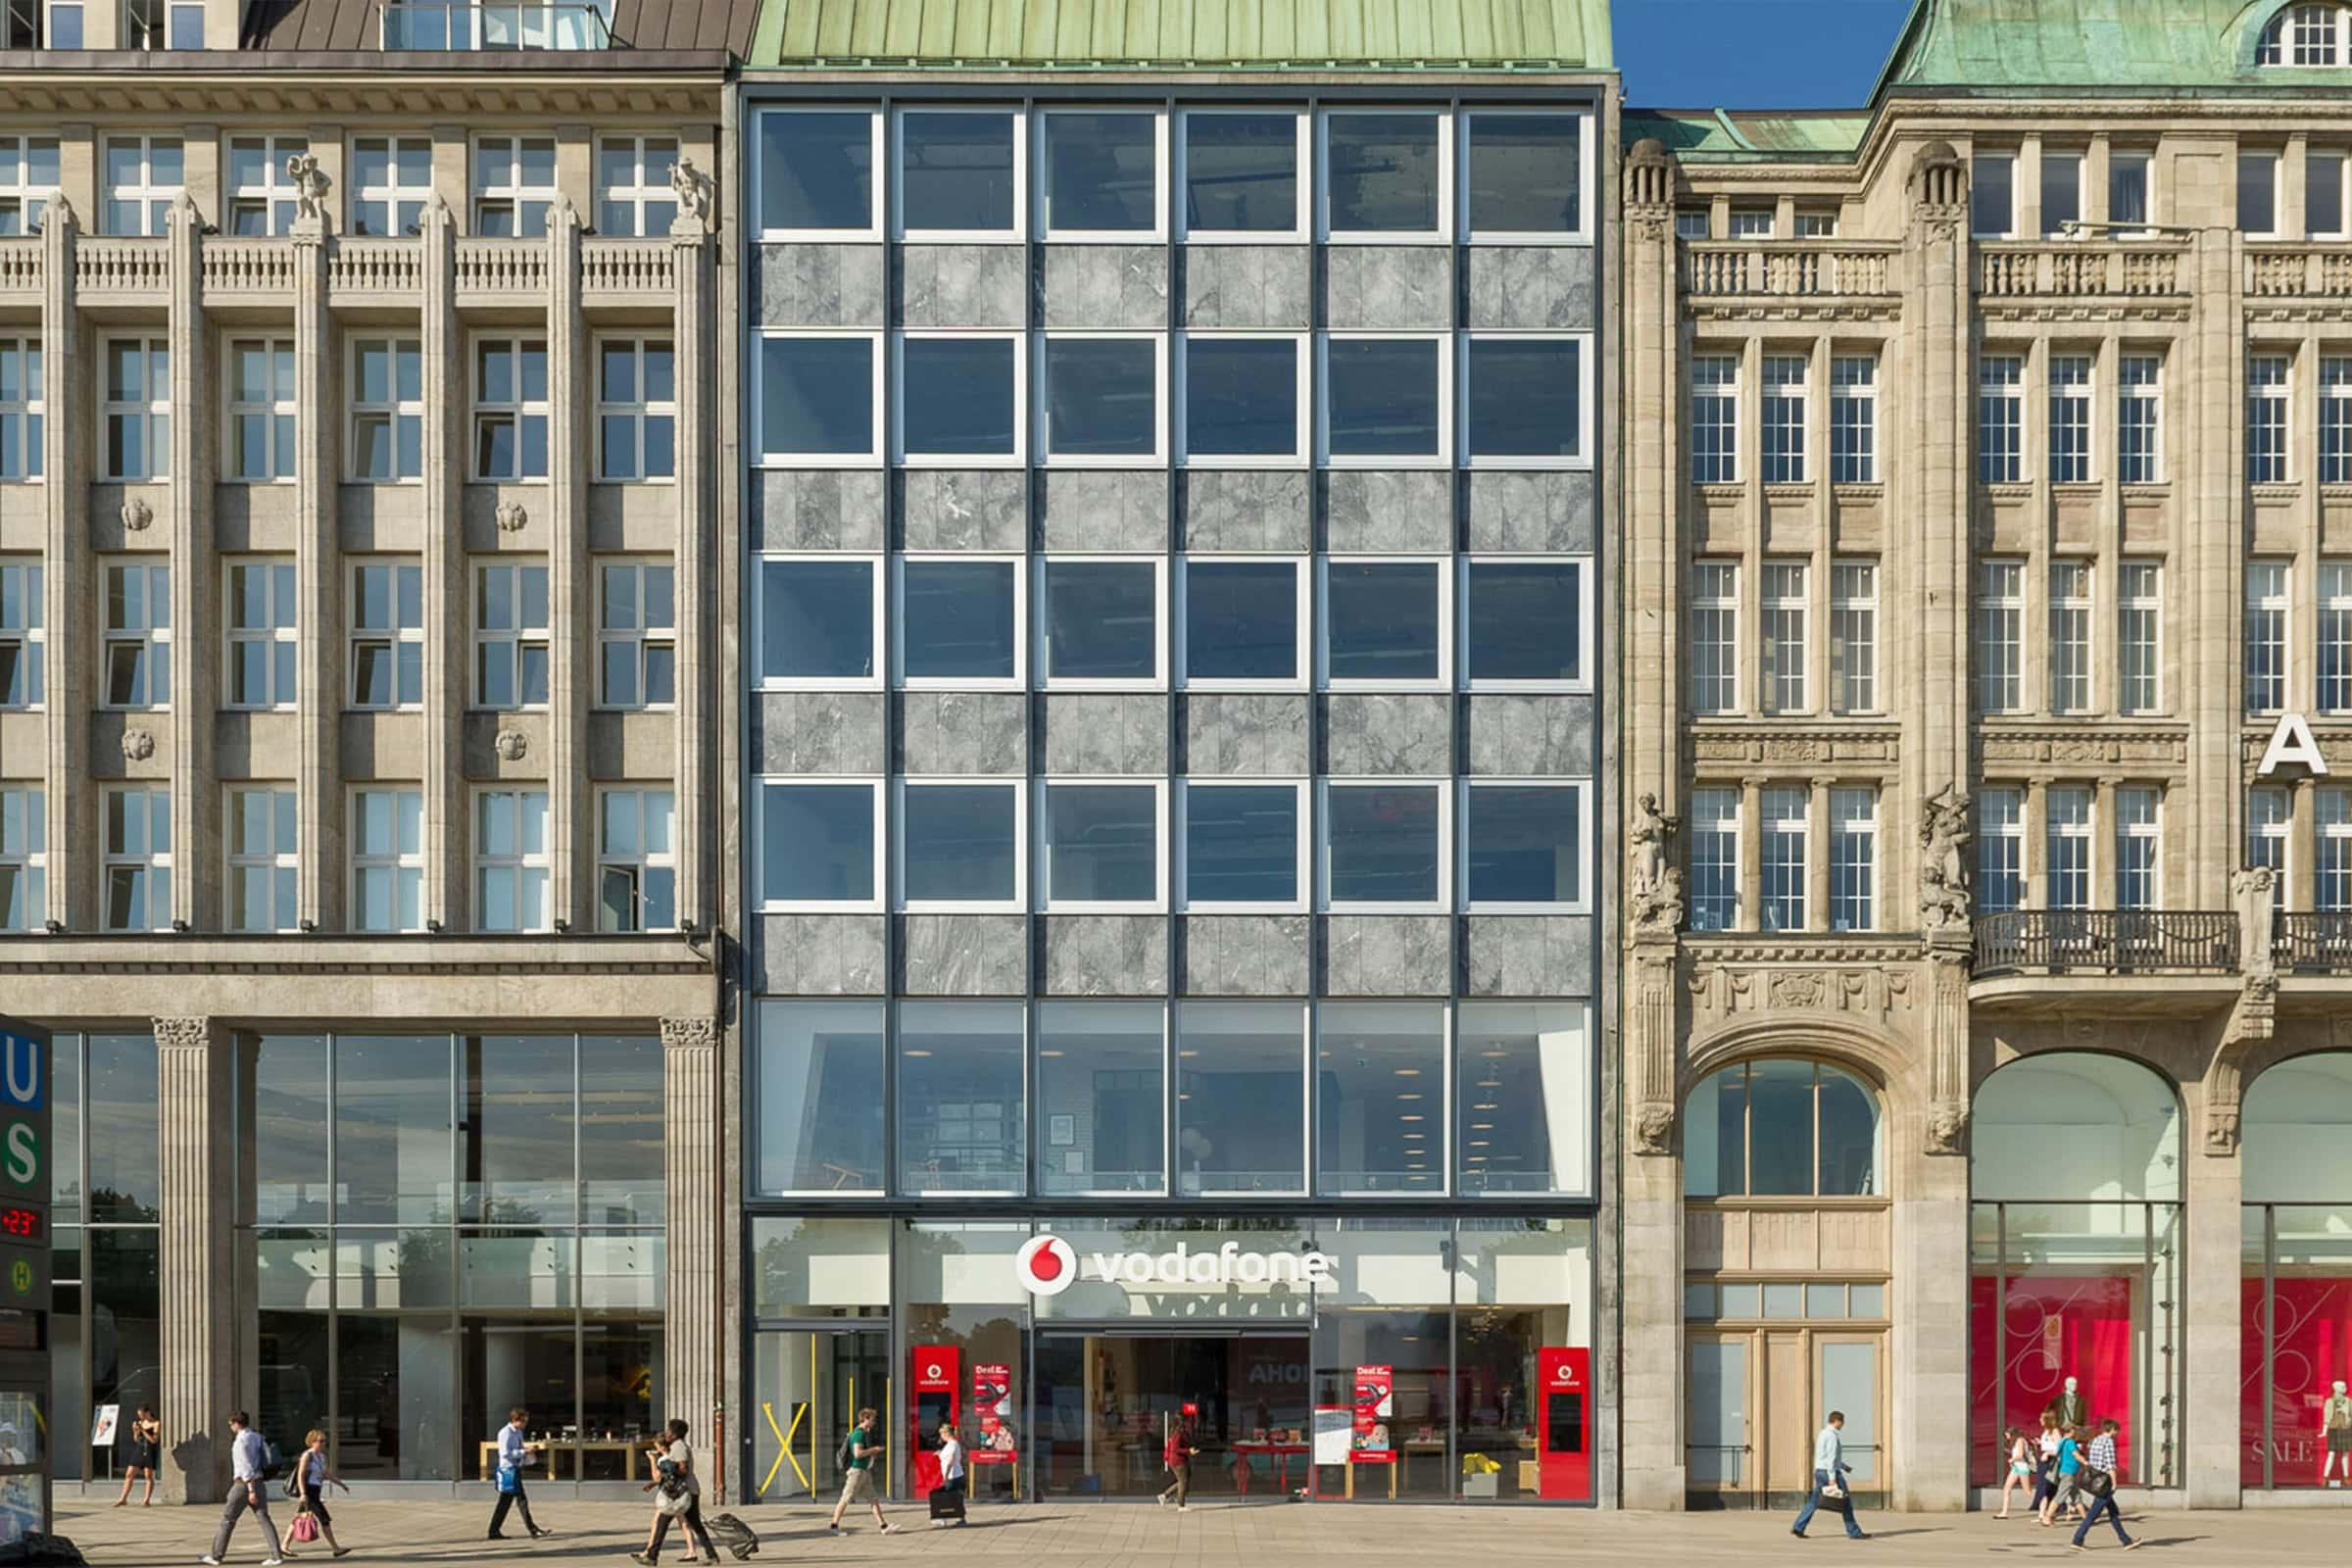 Vodafone, Flagship Store, Hamburg, Fassade, Jungfernstieg